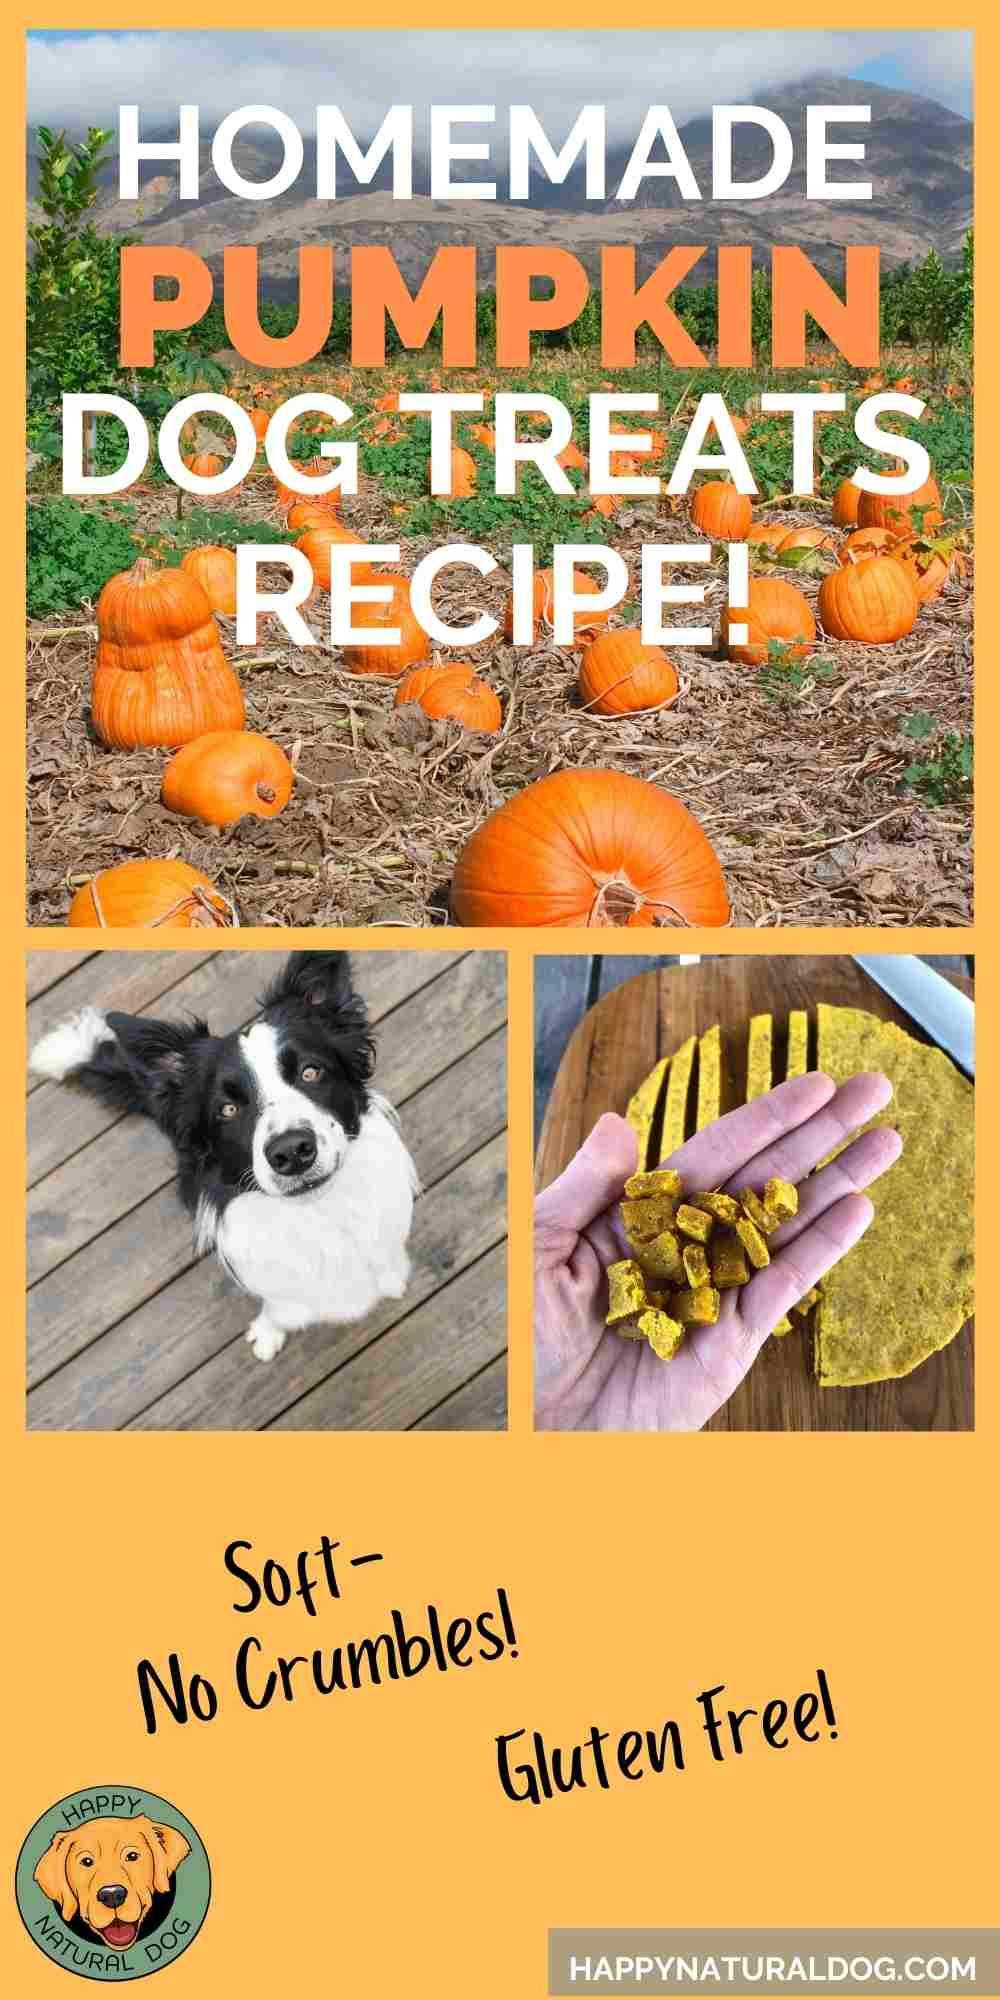 Homemade Pumpkin Dog Treats Recipe